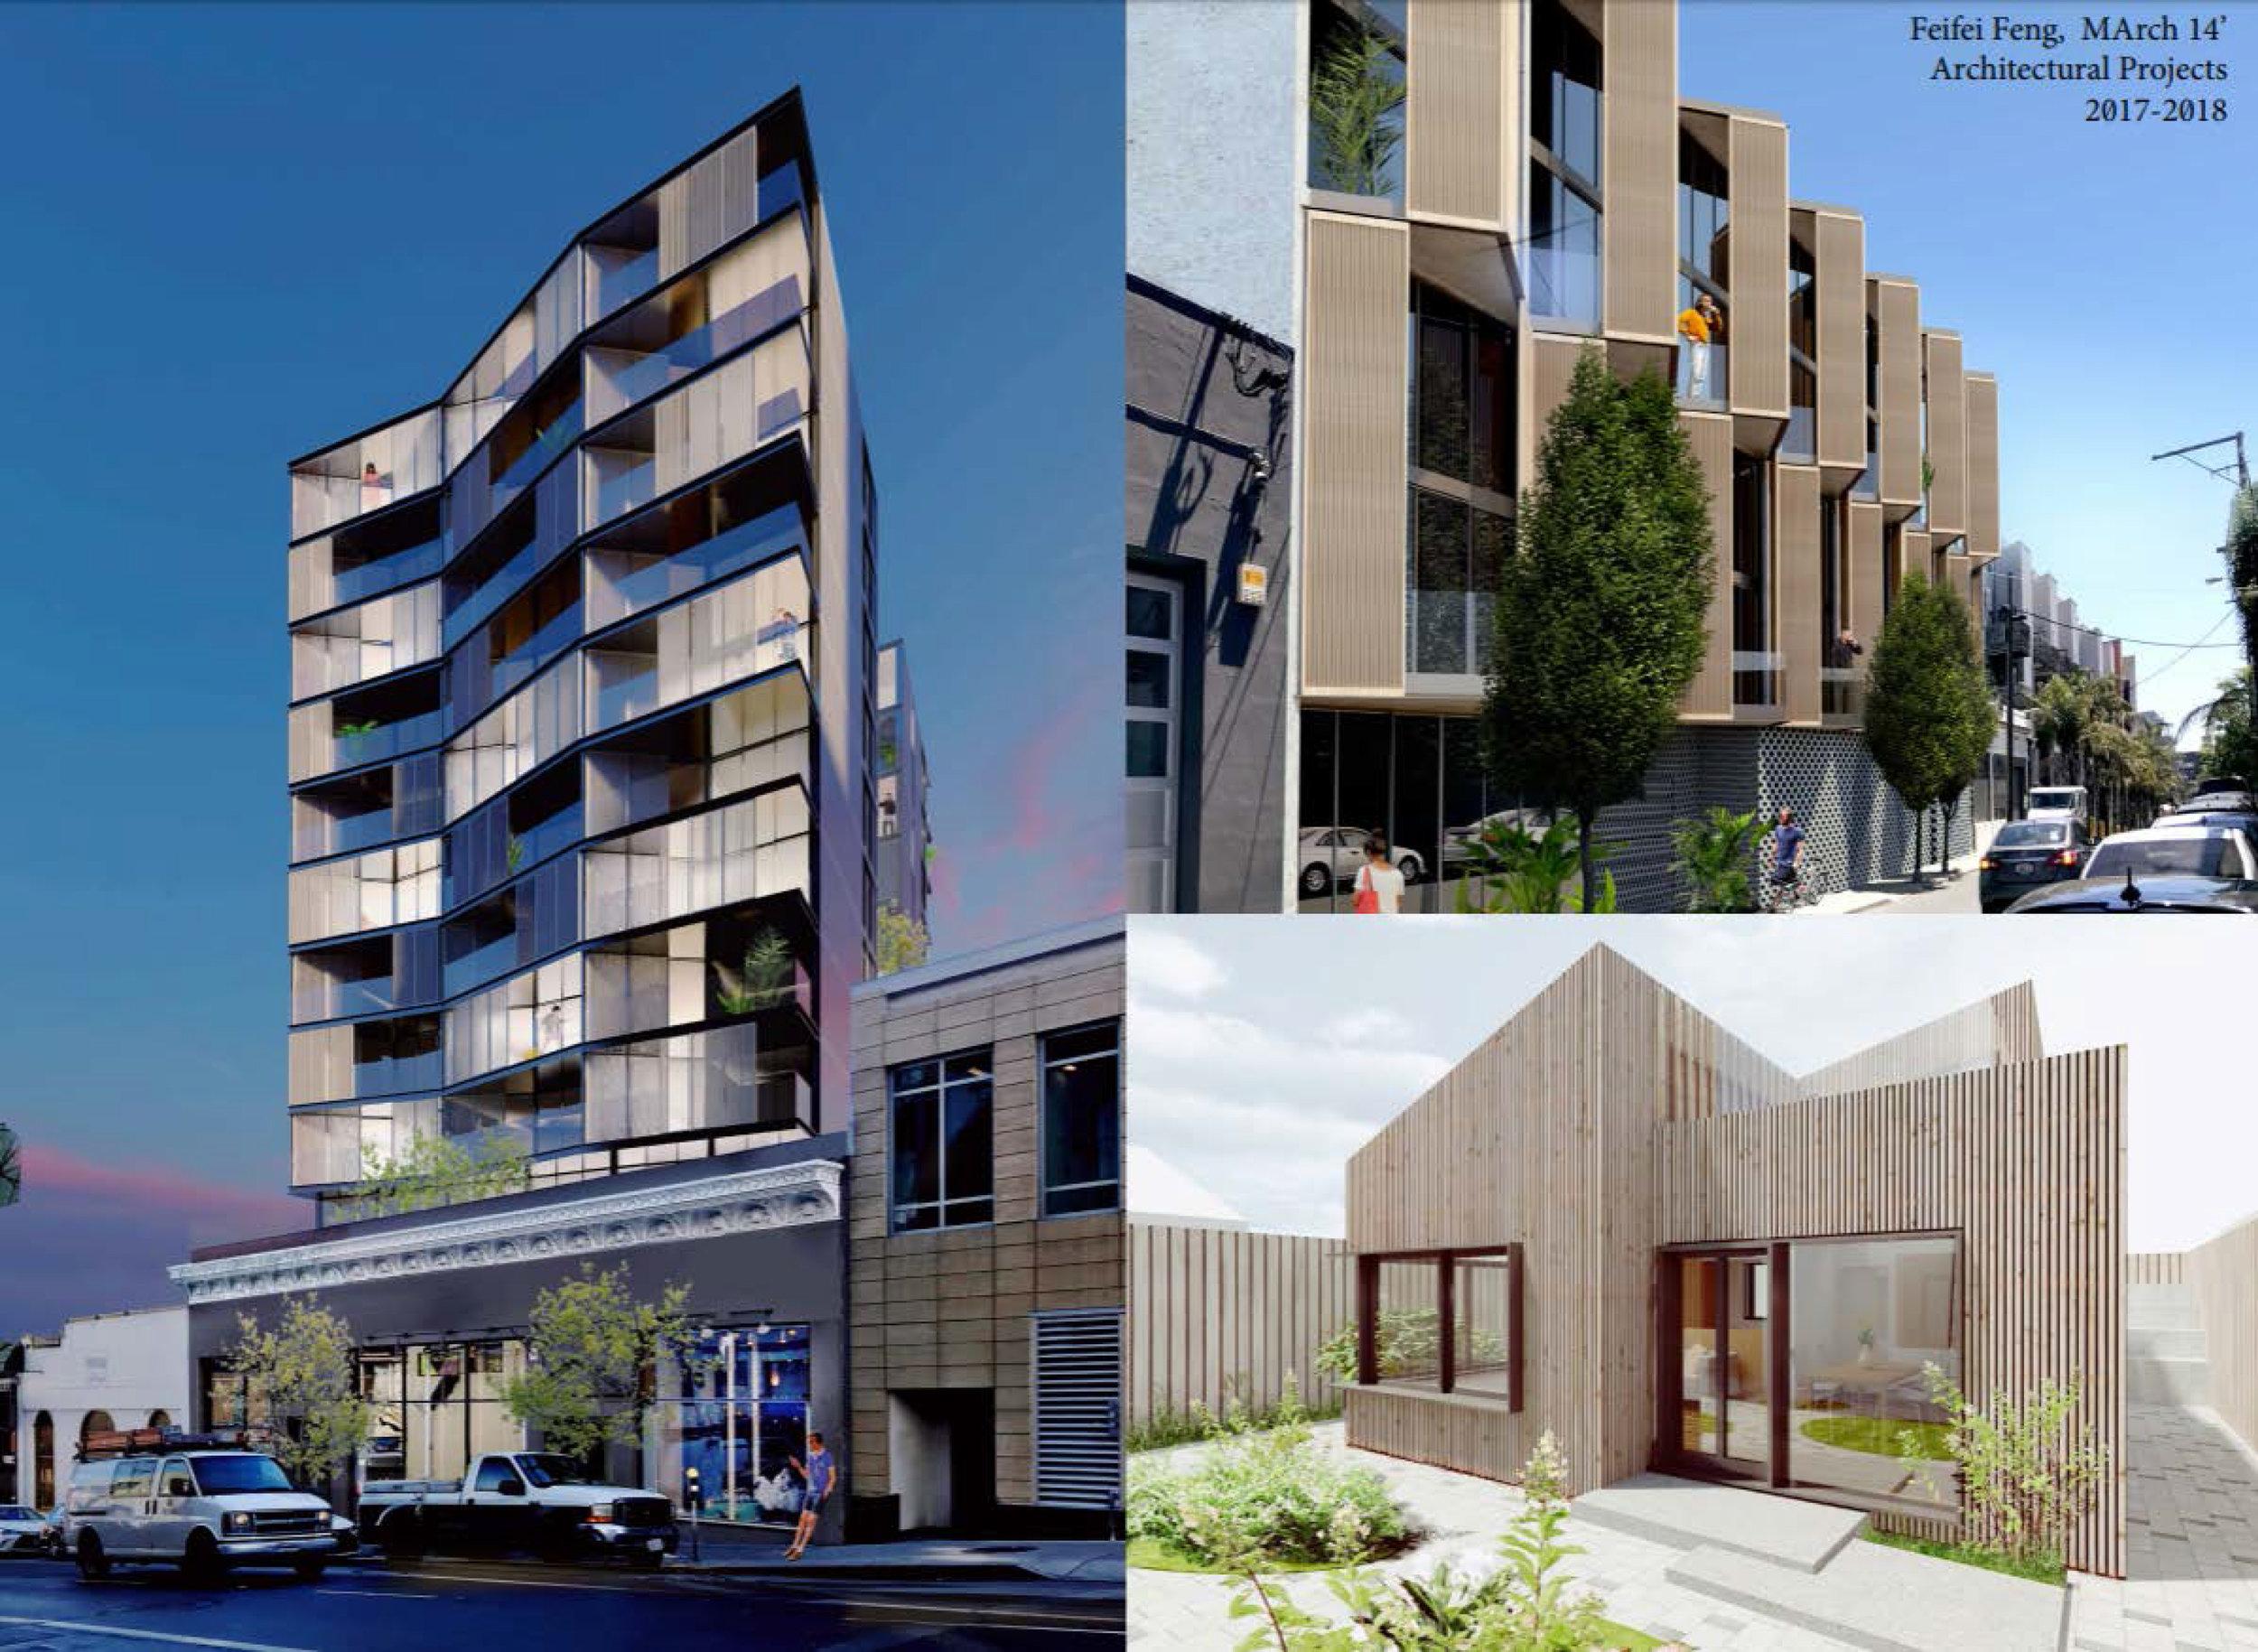 MIT ARCHITECTURE 150 SAN FRANCISCO SLIDESHOW-138 copy.jpg